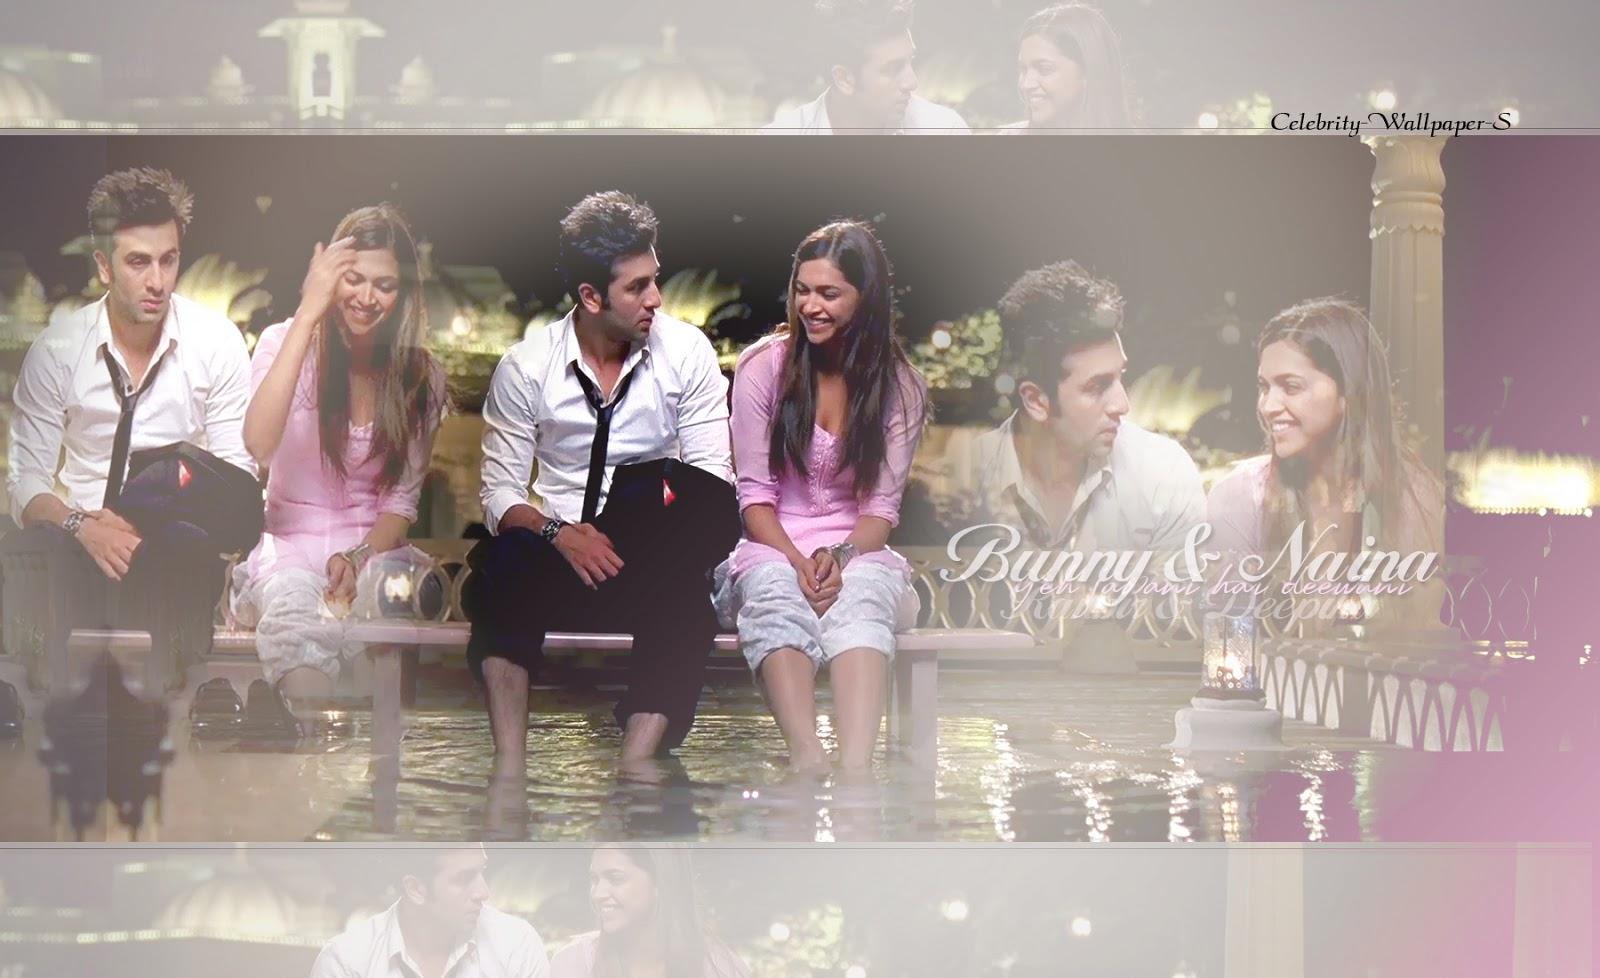 Ranbir And Deepika In Yeh Jawani Hai Deewani Wallpaper ...